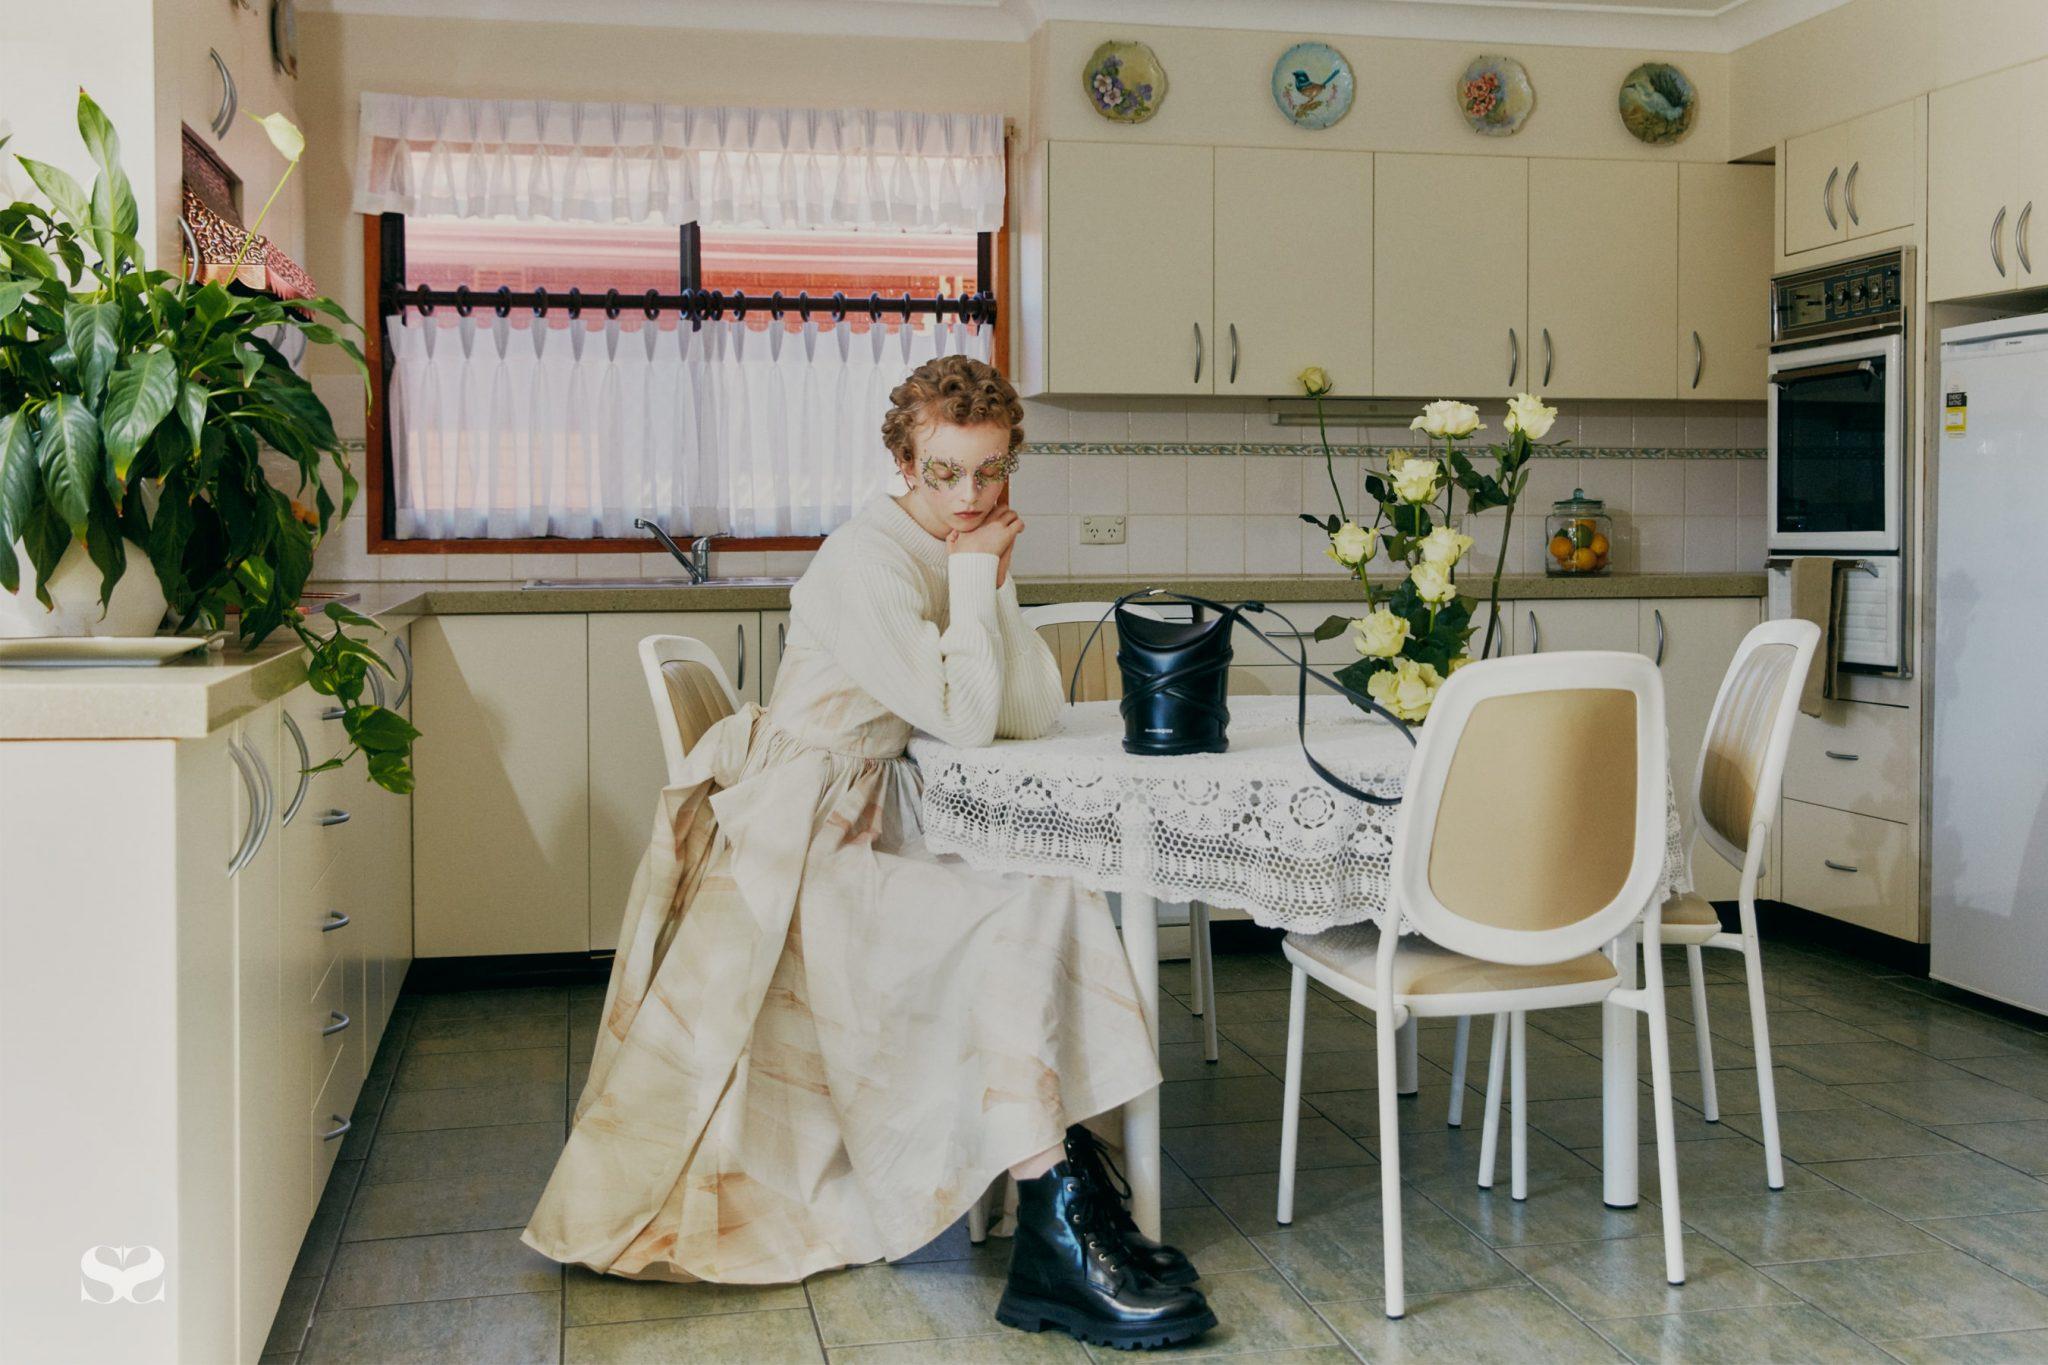 Alexander McQueen Majestic issue